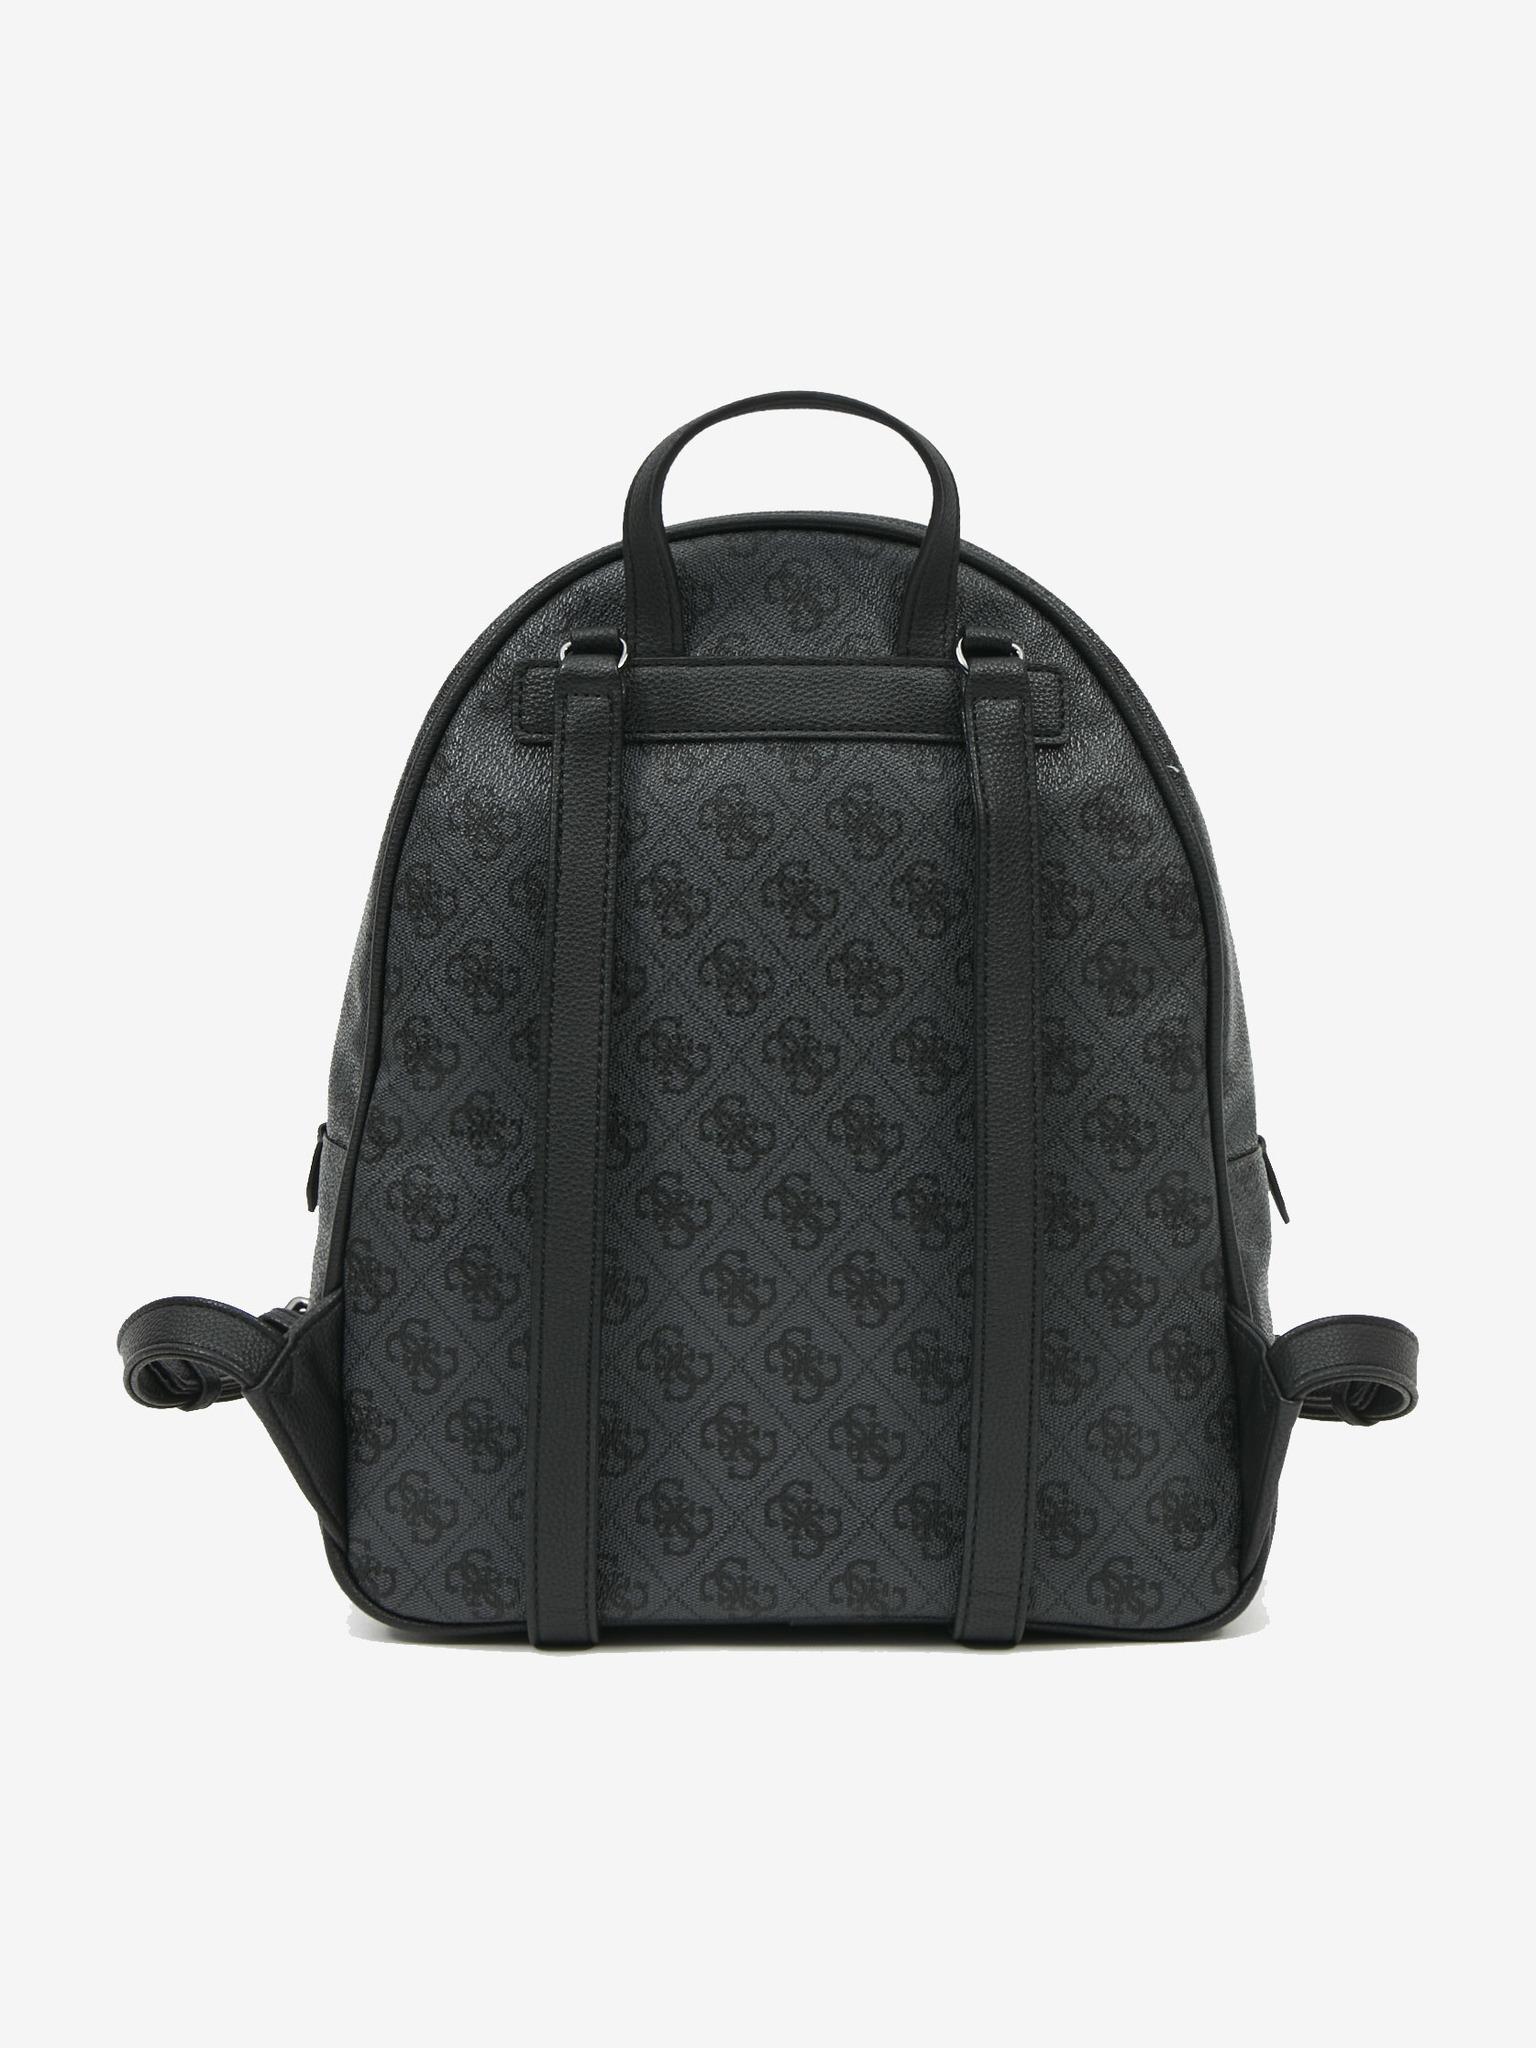 Guess black backpack Manhattan Large